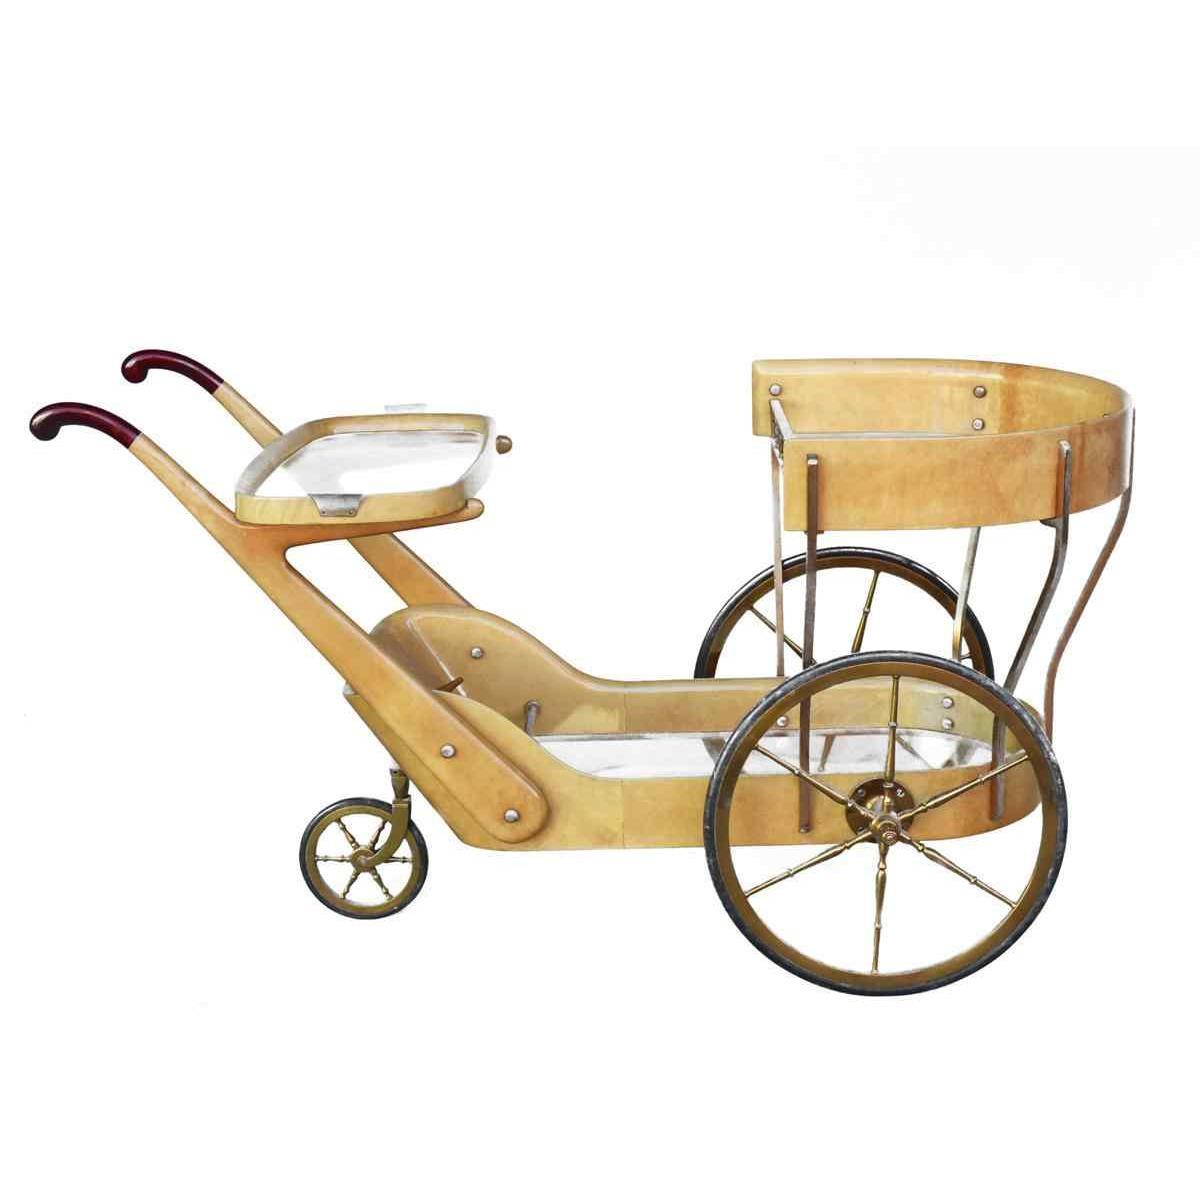 Aldo Tura barre de chariot parchemin